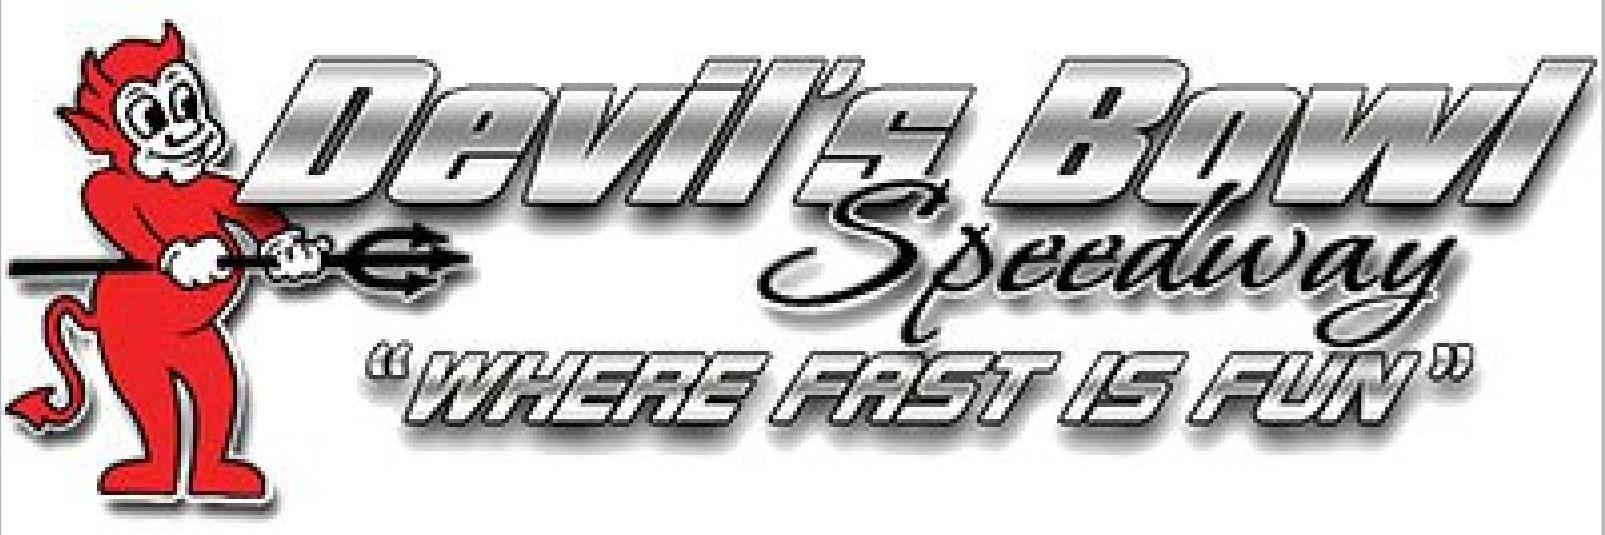 10/15/2021 - Devil's Bowl Speedway